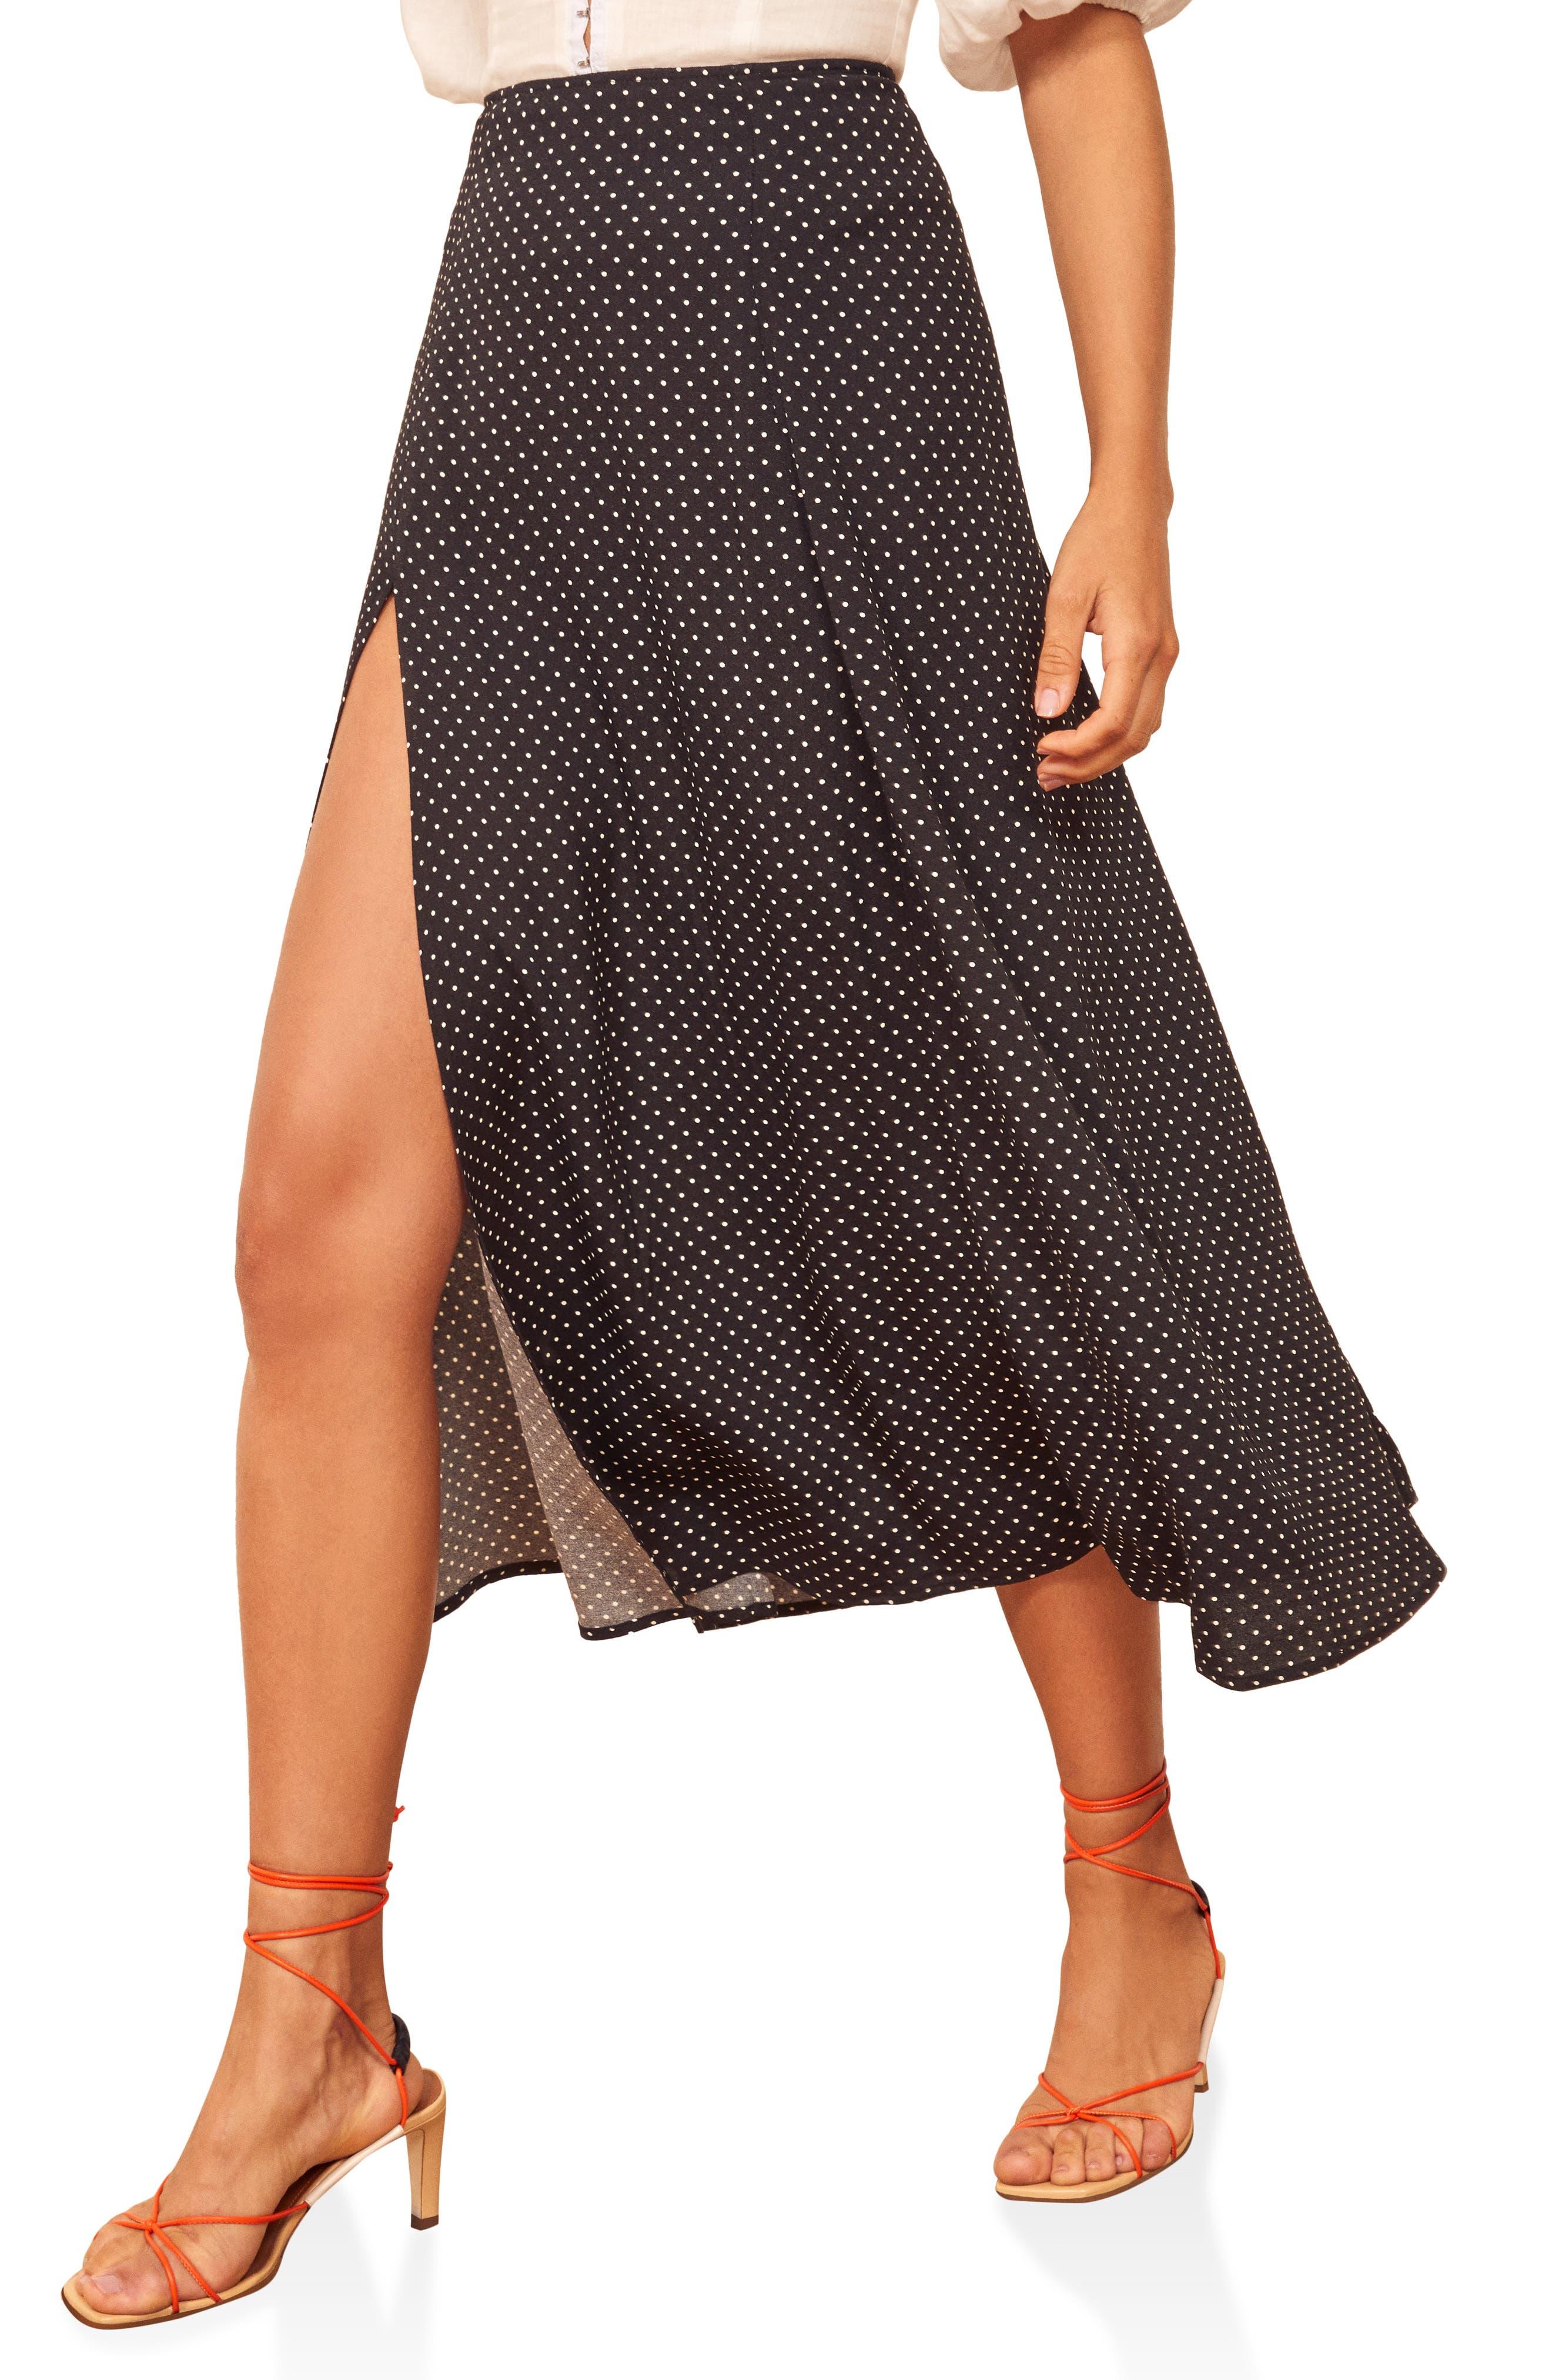 be26c5d3d2 Skirts All Women | Nordstrom